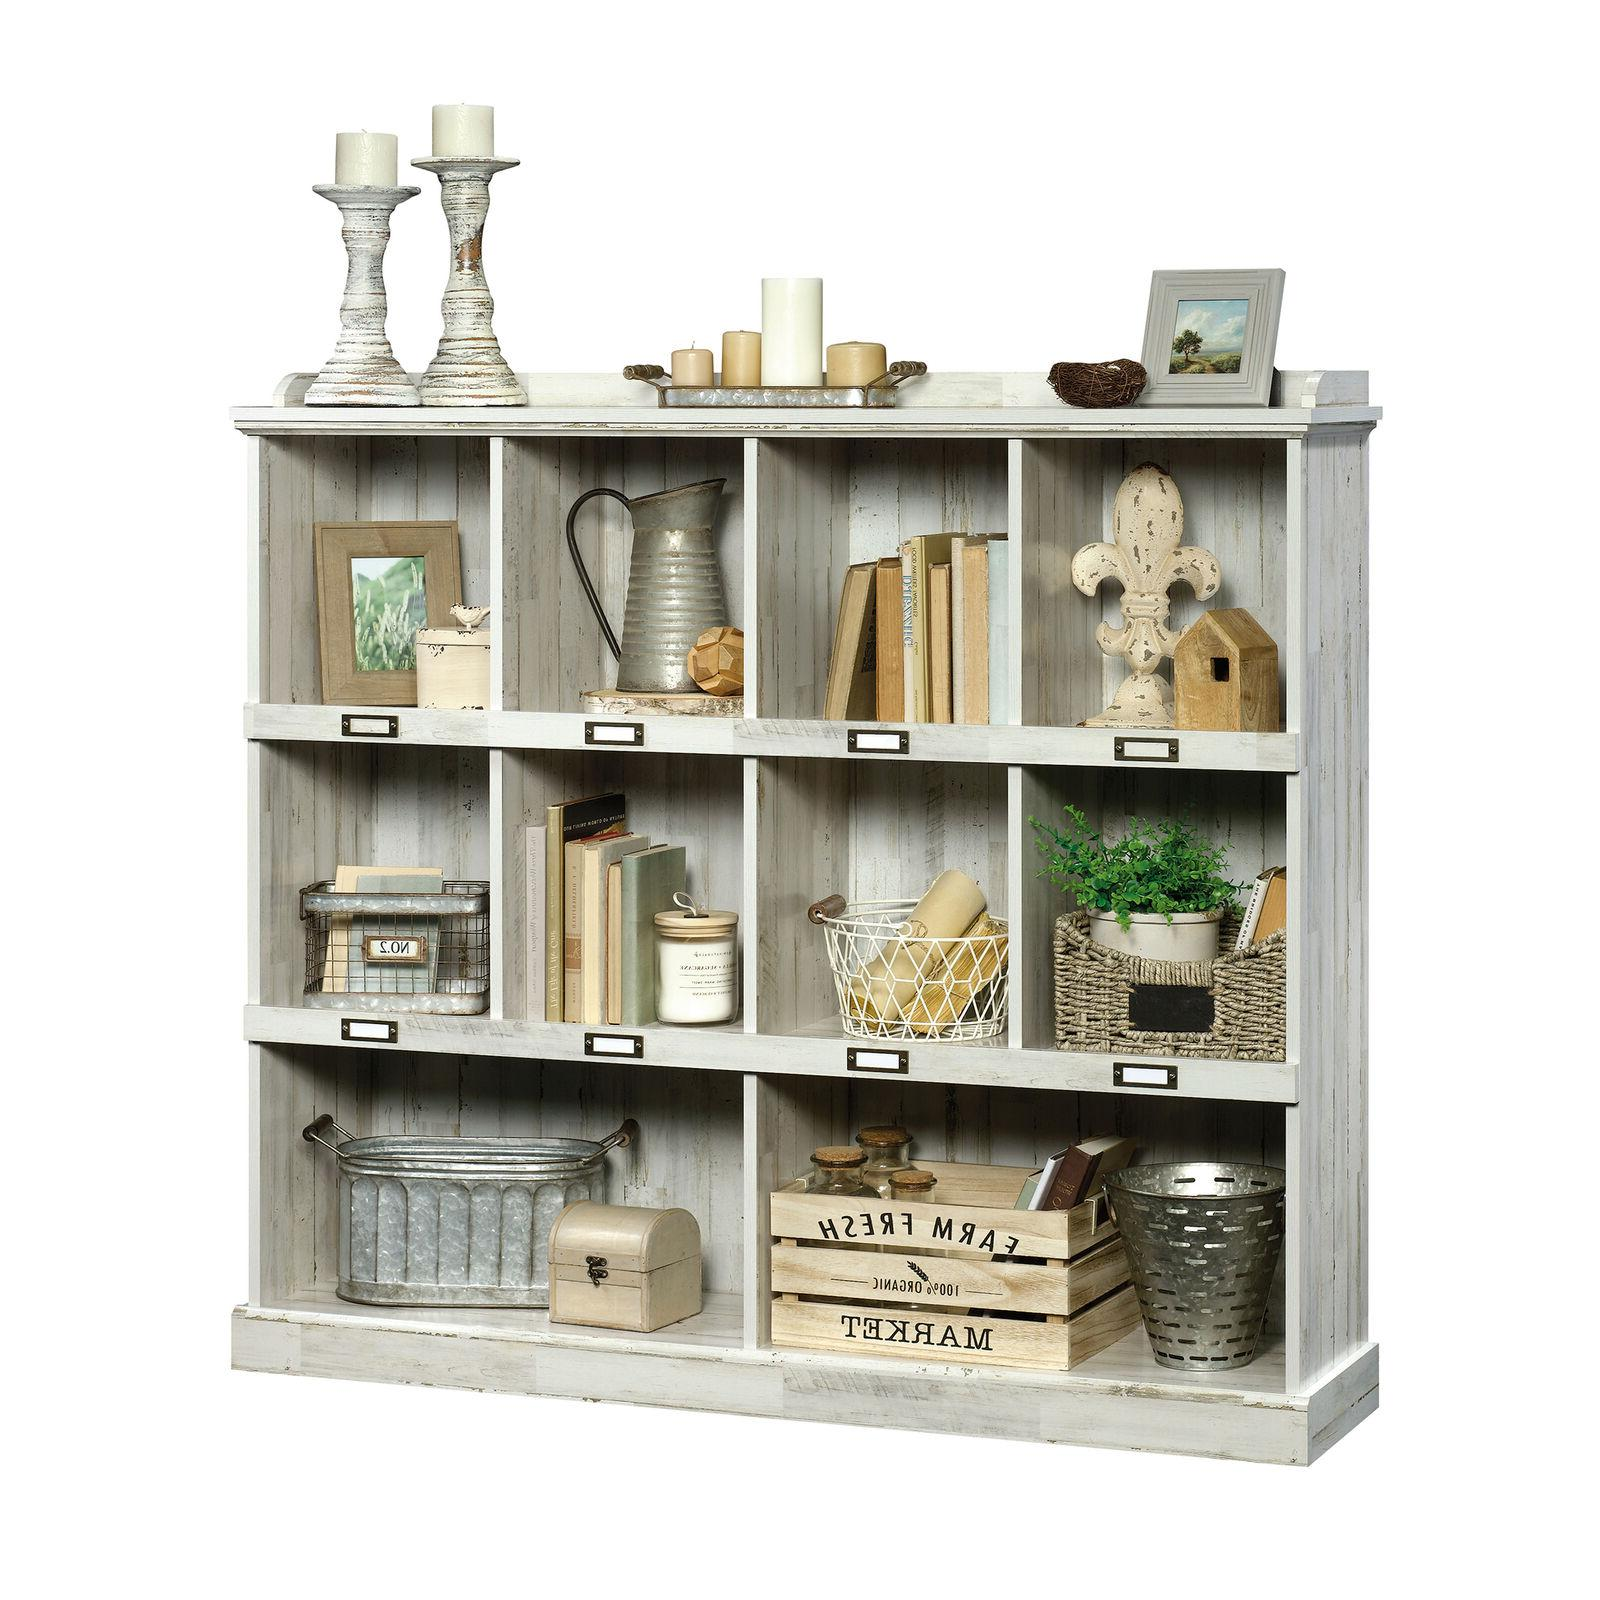 Storage Shelves Organizer Living Bookshelf Furniture